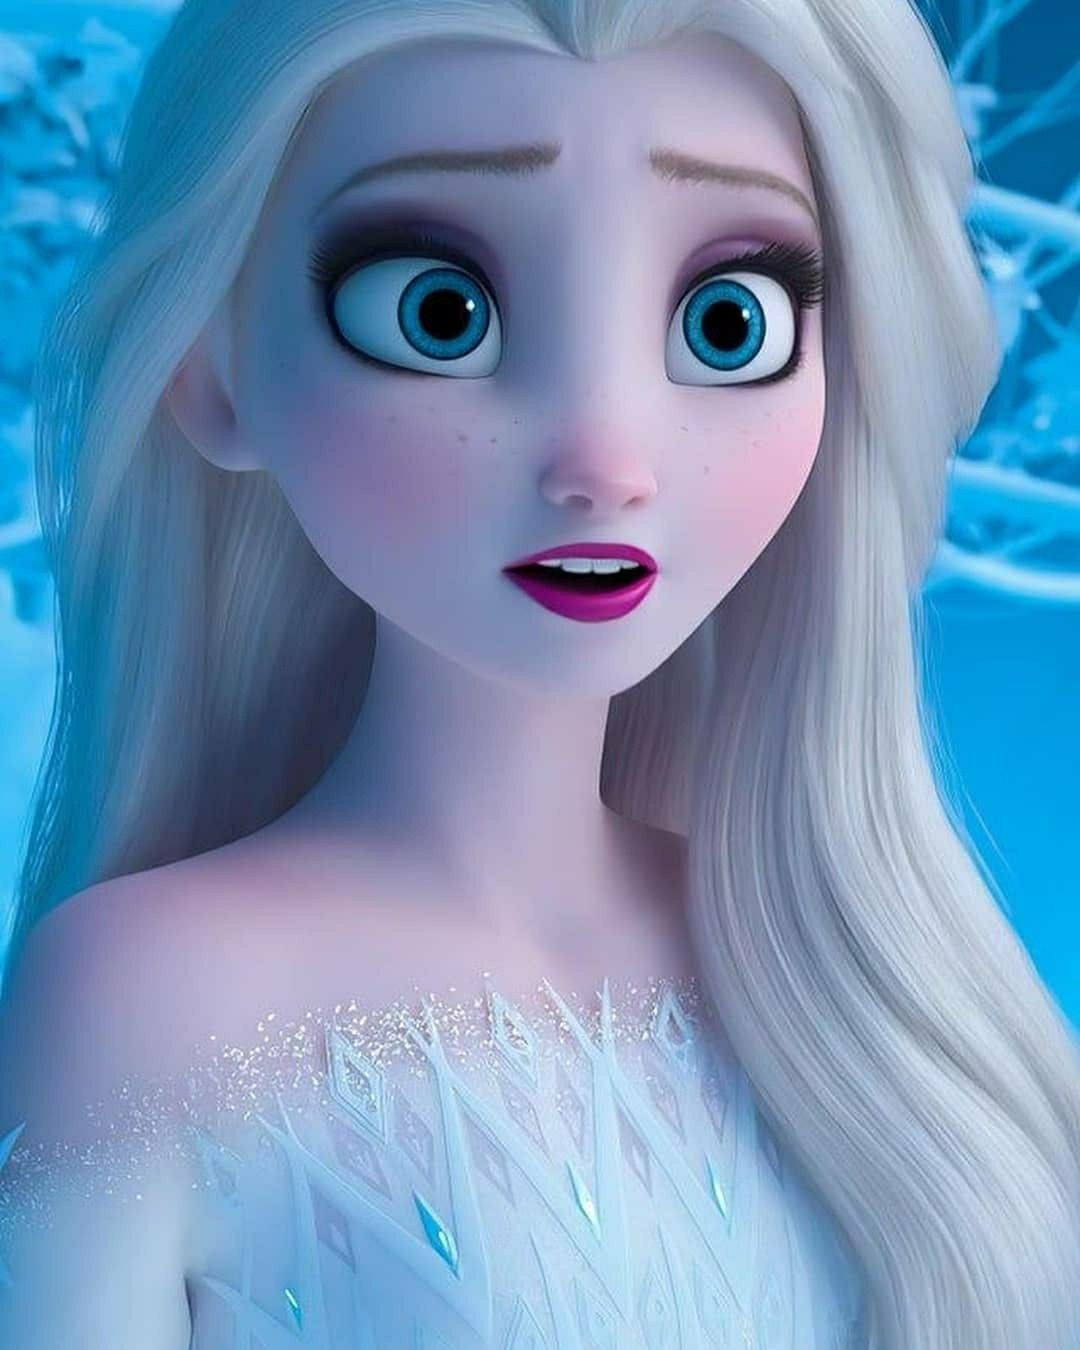 Pin By جنة علي On خلفيات Disney Princess Pictures Disney Princess Elsa Elsa